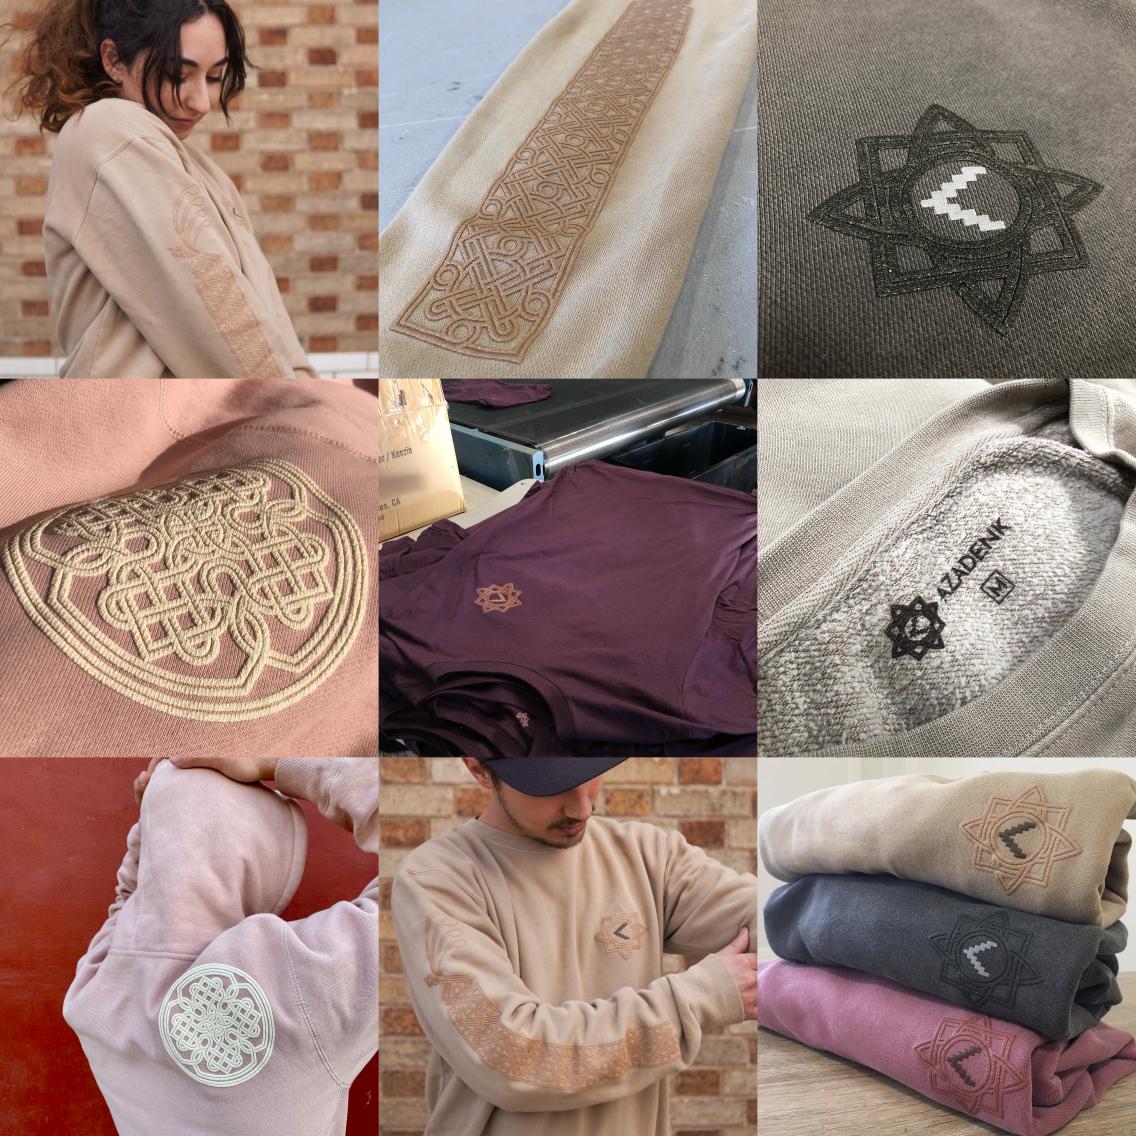 Various Khachkar details printed on different clothes